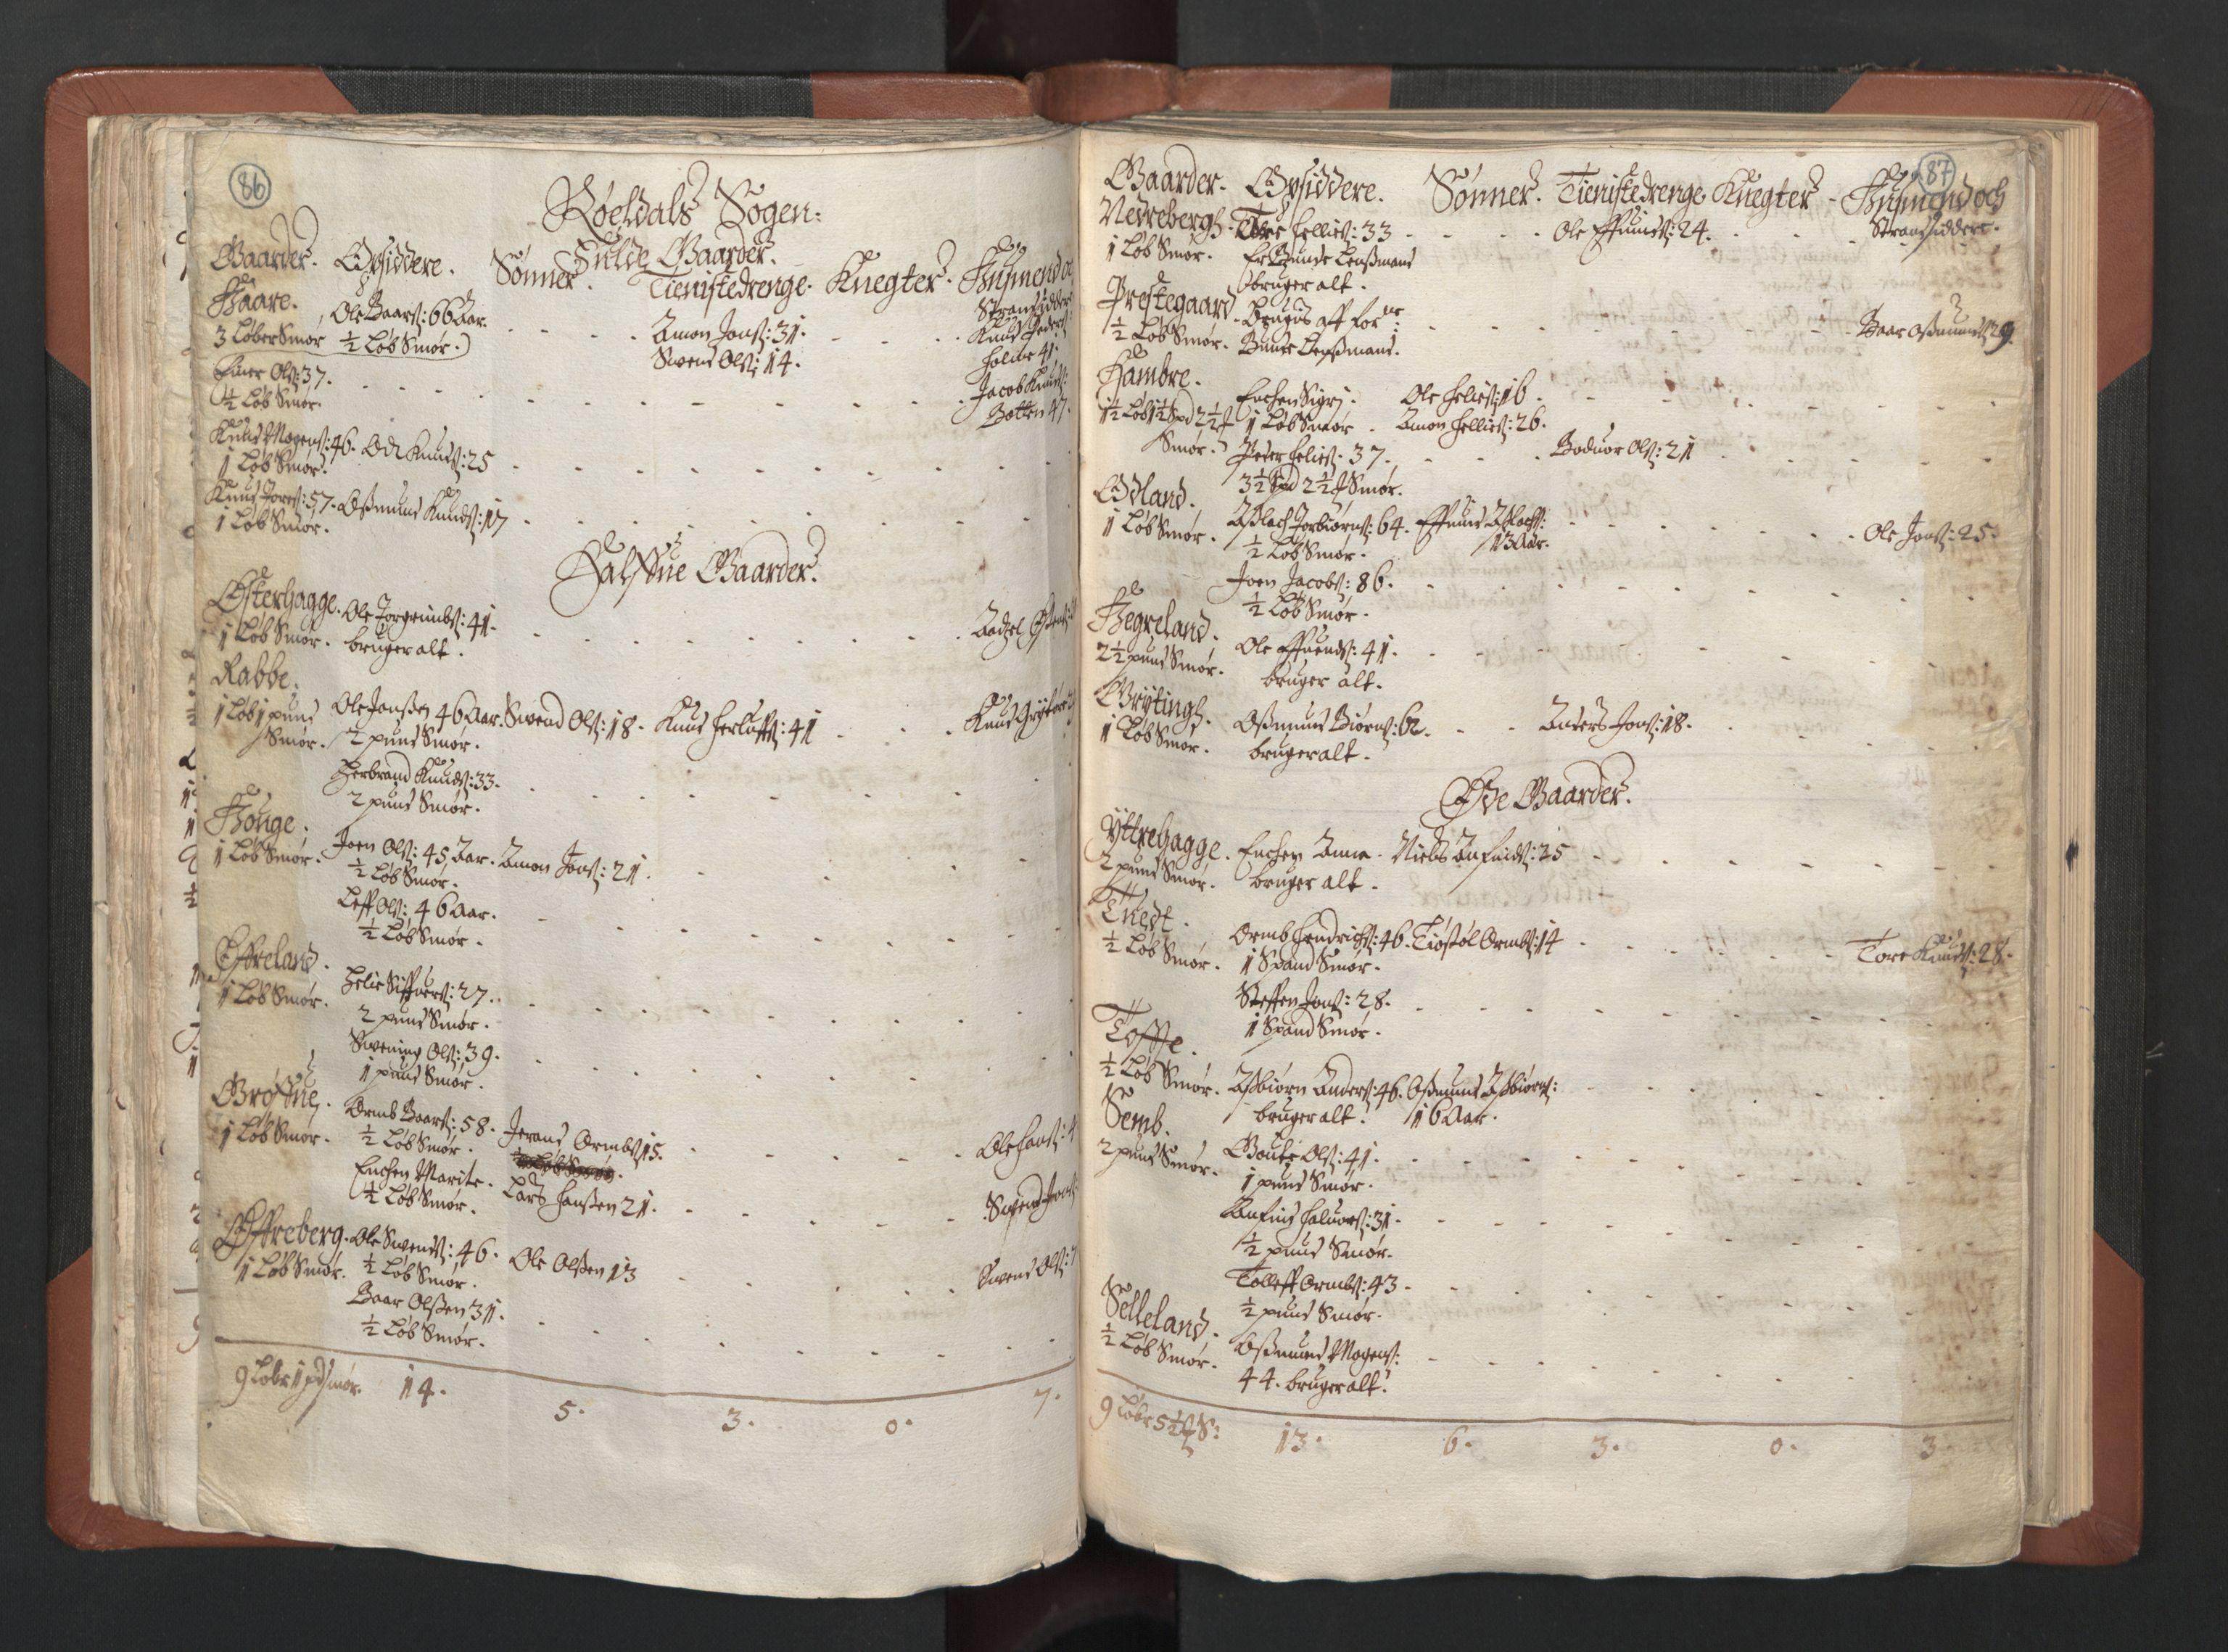 RA, Fogdenes og sorenskrivernes manntall 1664-1666, nr. 14: Hardanger len, Ytre Sogn fogderi og Indre Sogn fogderi, 1664-1665, s. 86-87